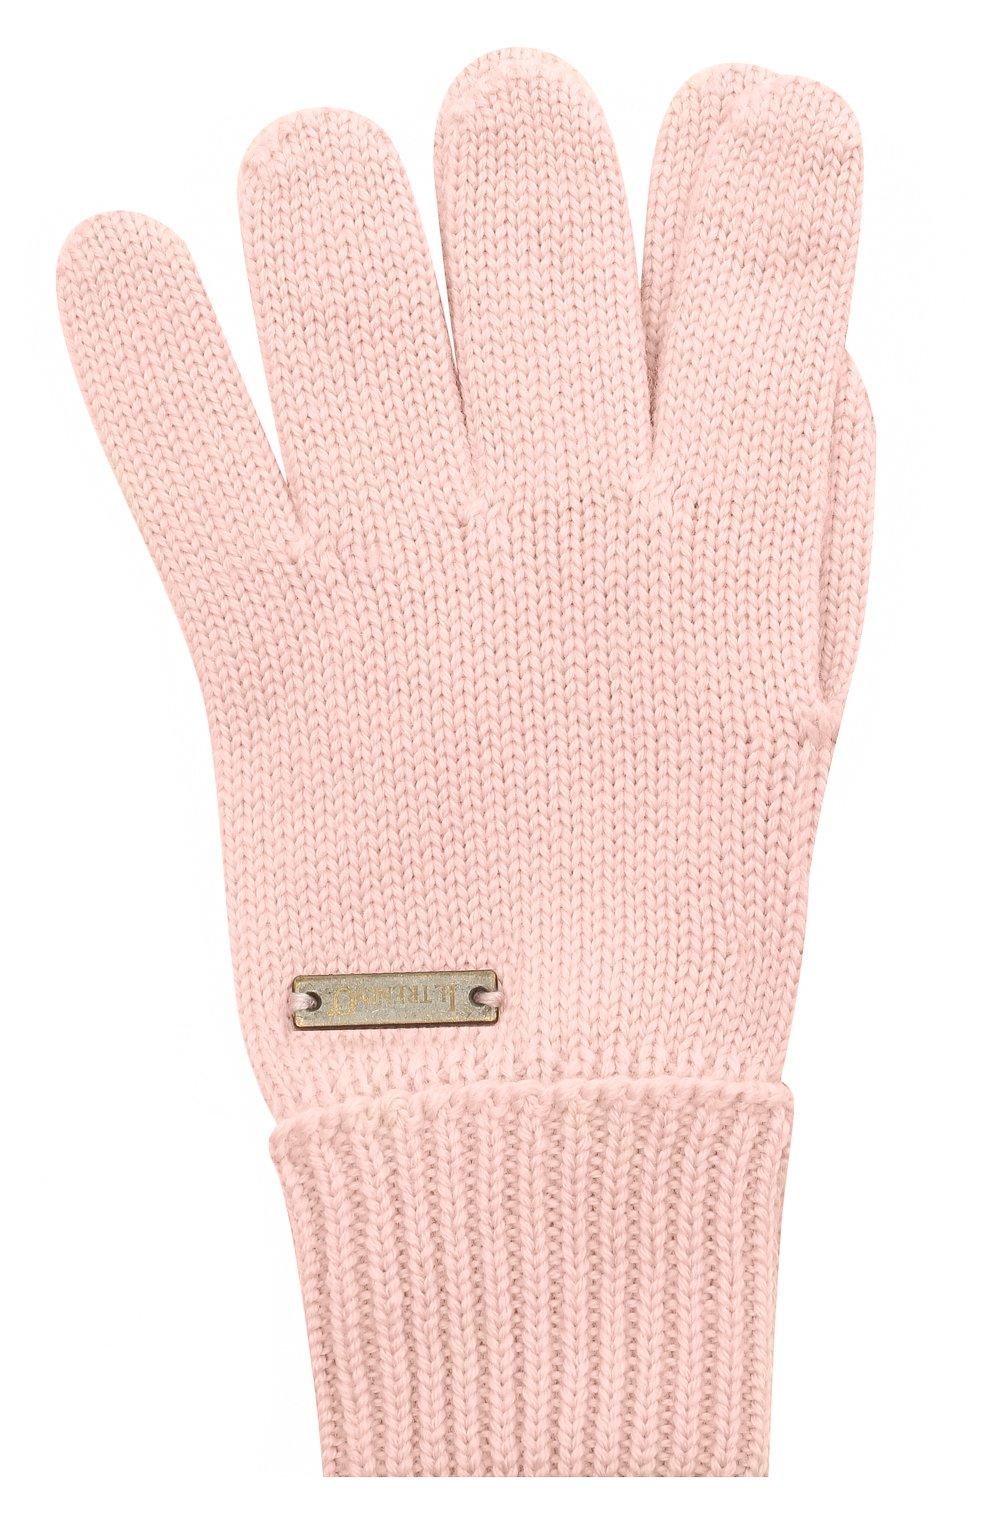 Детские шерстяные перчатки IL TRENINO розового цвета, арт. 20 4055/E0 | Фото 1